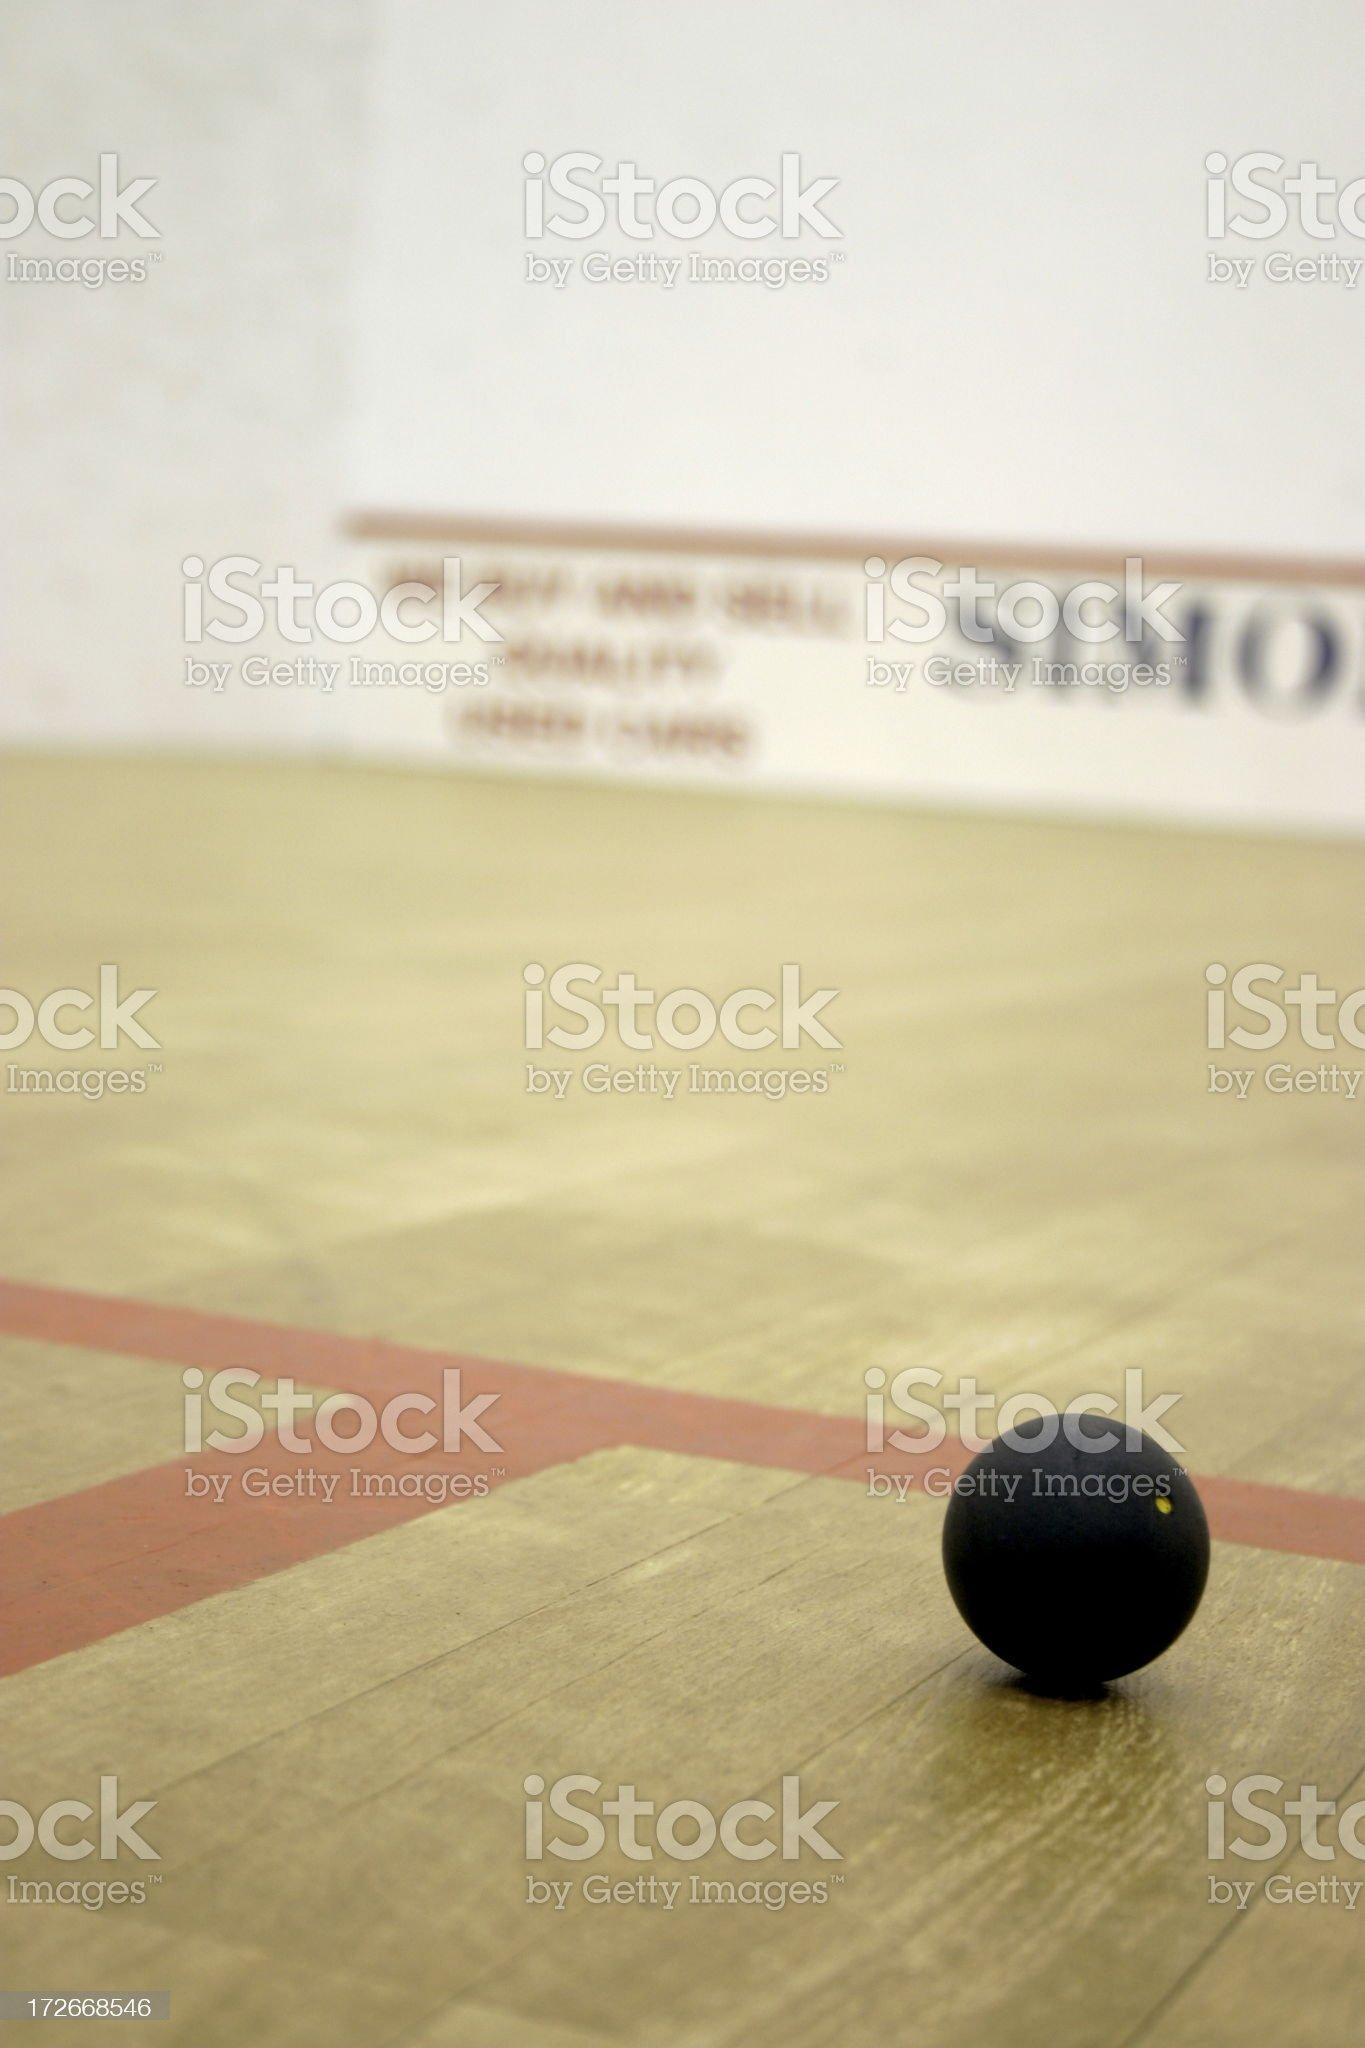 Squash_ball2 royalty-free stock photo